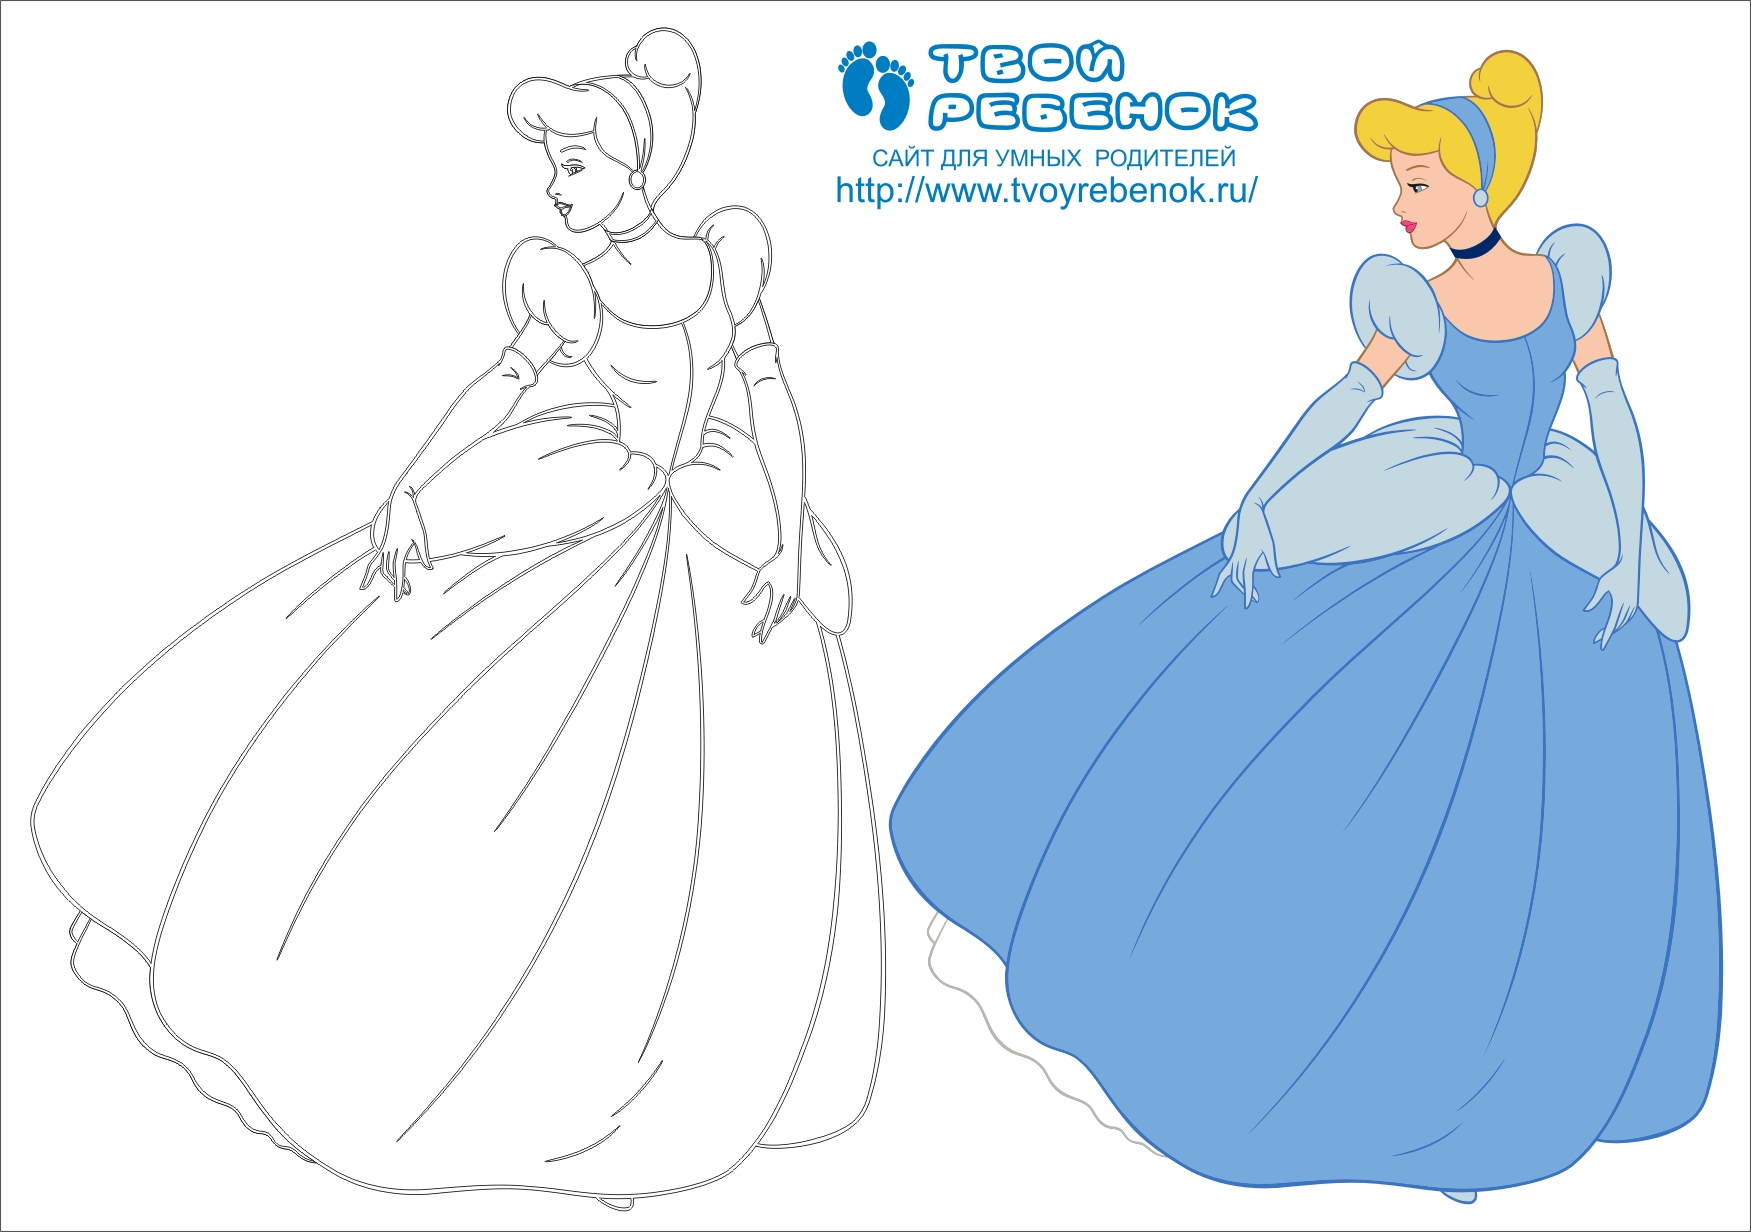 Dessiner les princesses disney - Dessiner princesse disney ...